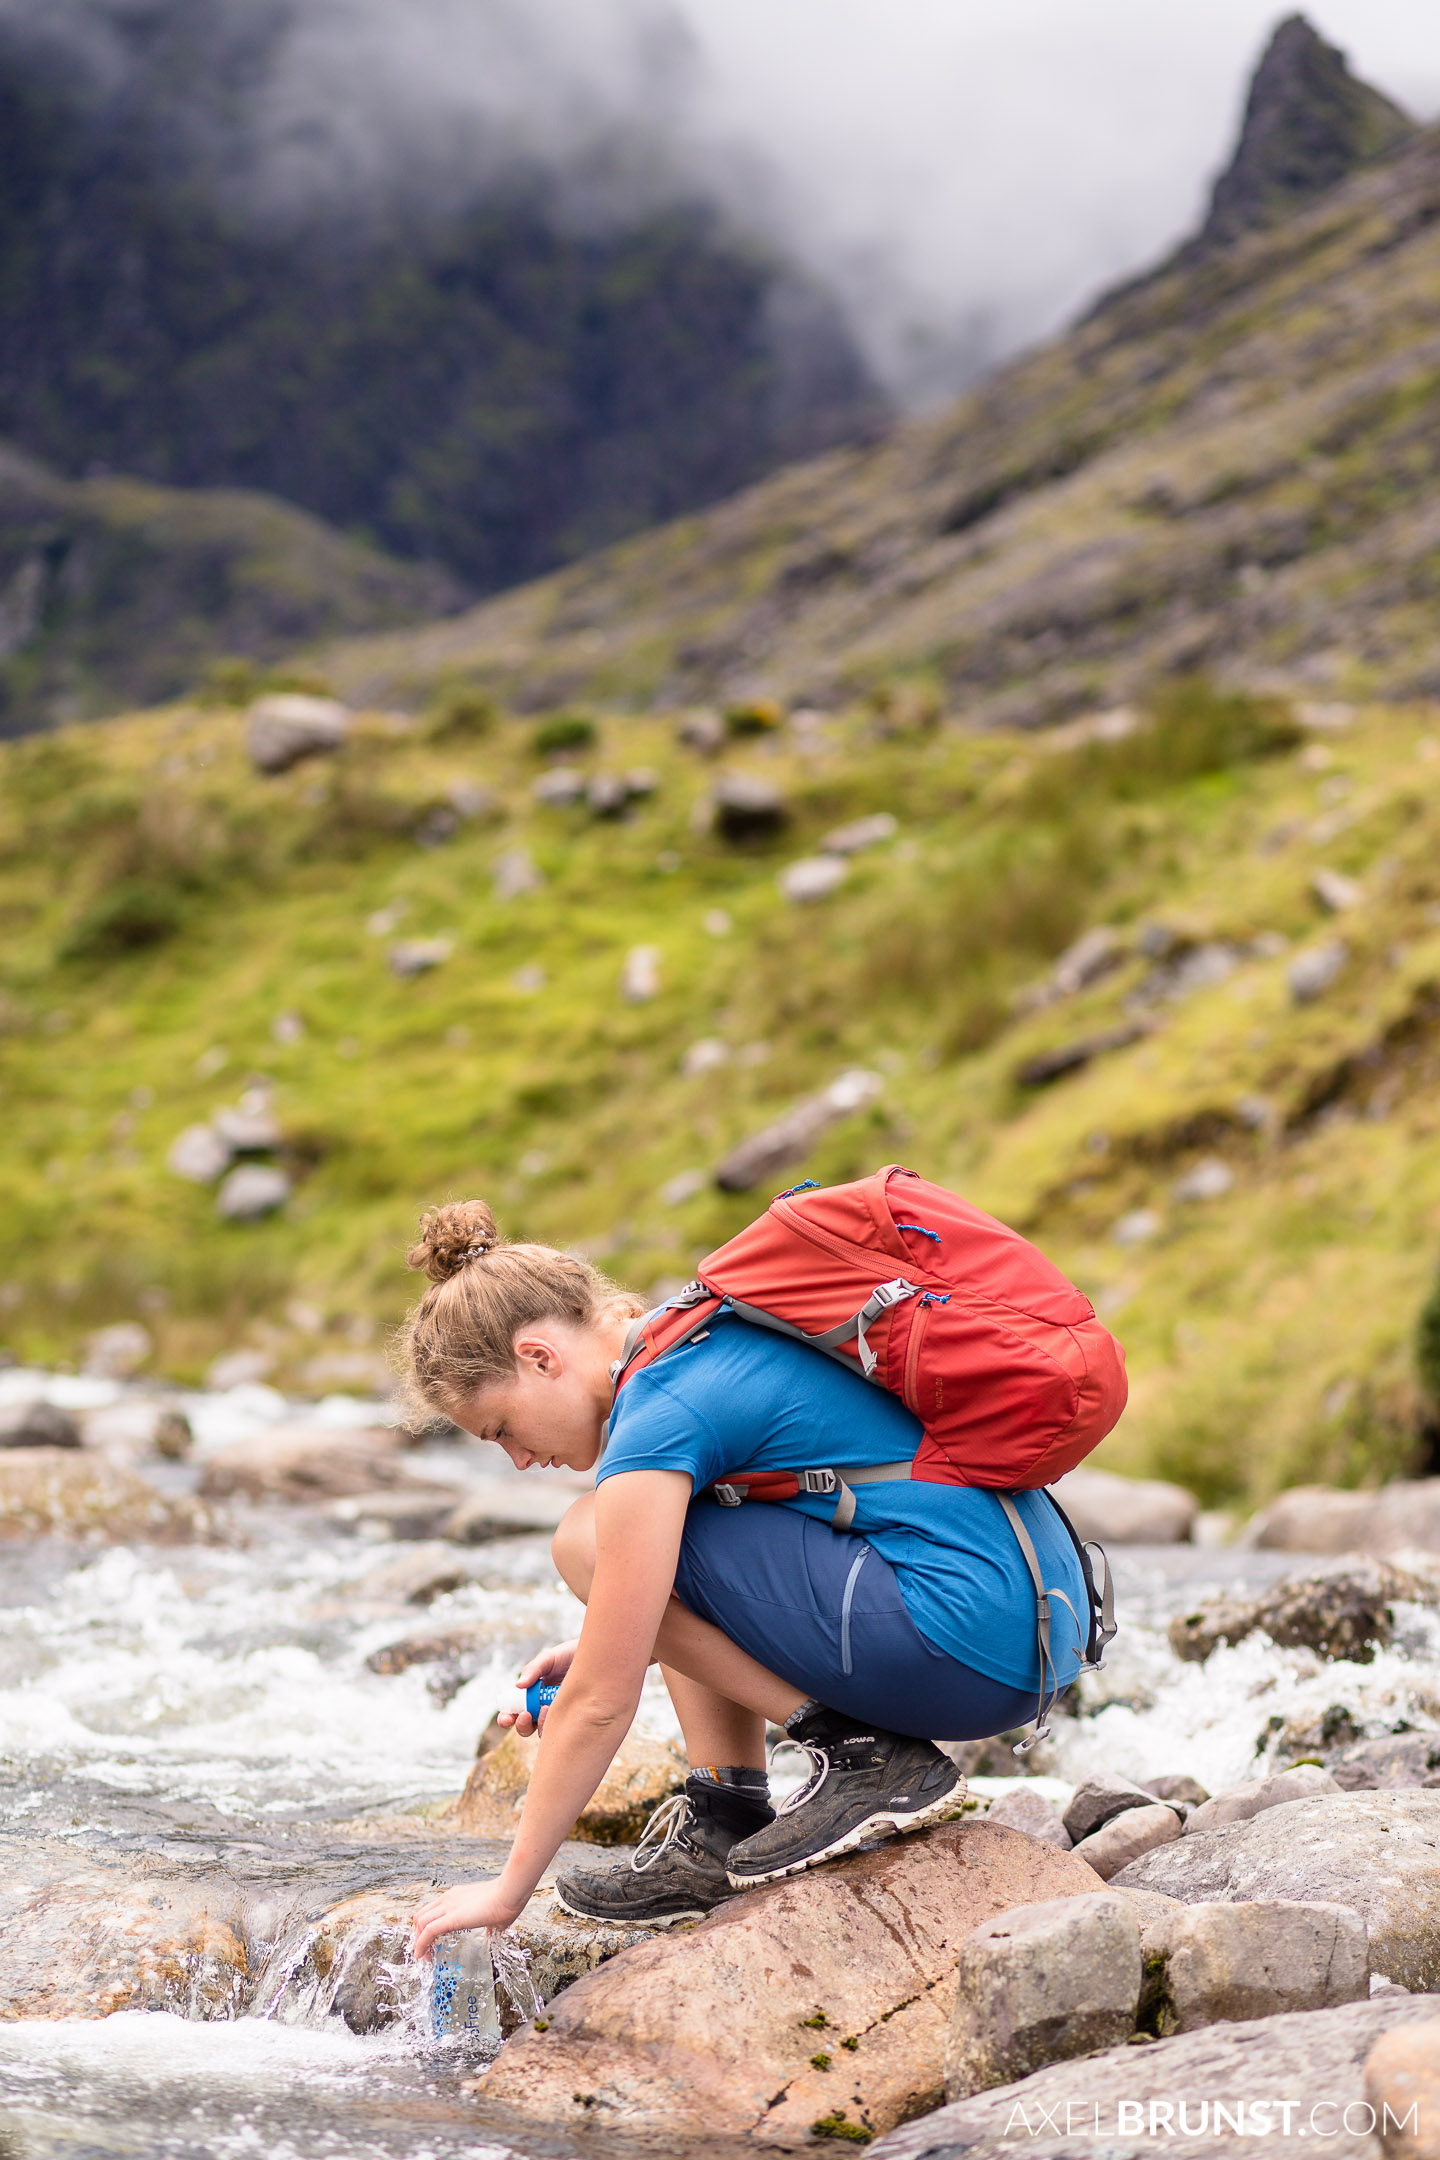 carantuohill-hike-ireland-2.jpg